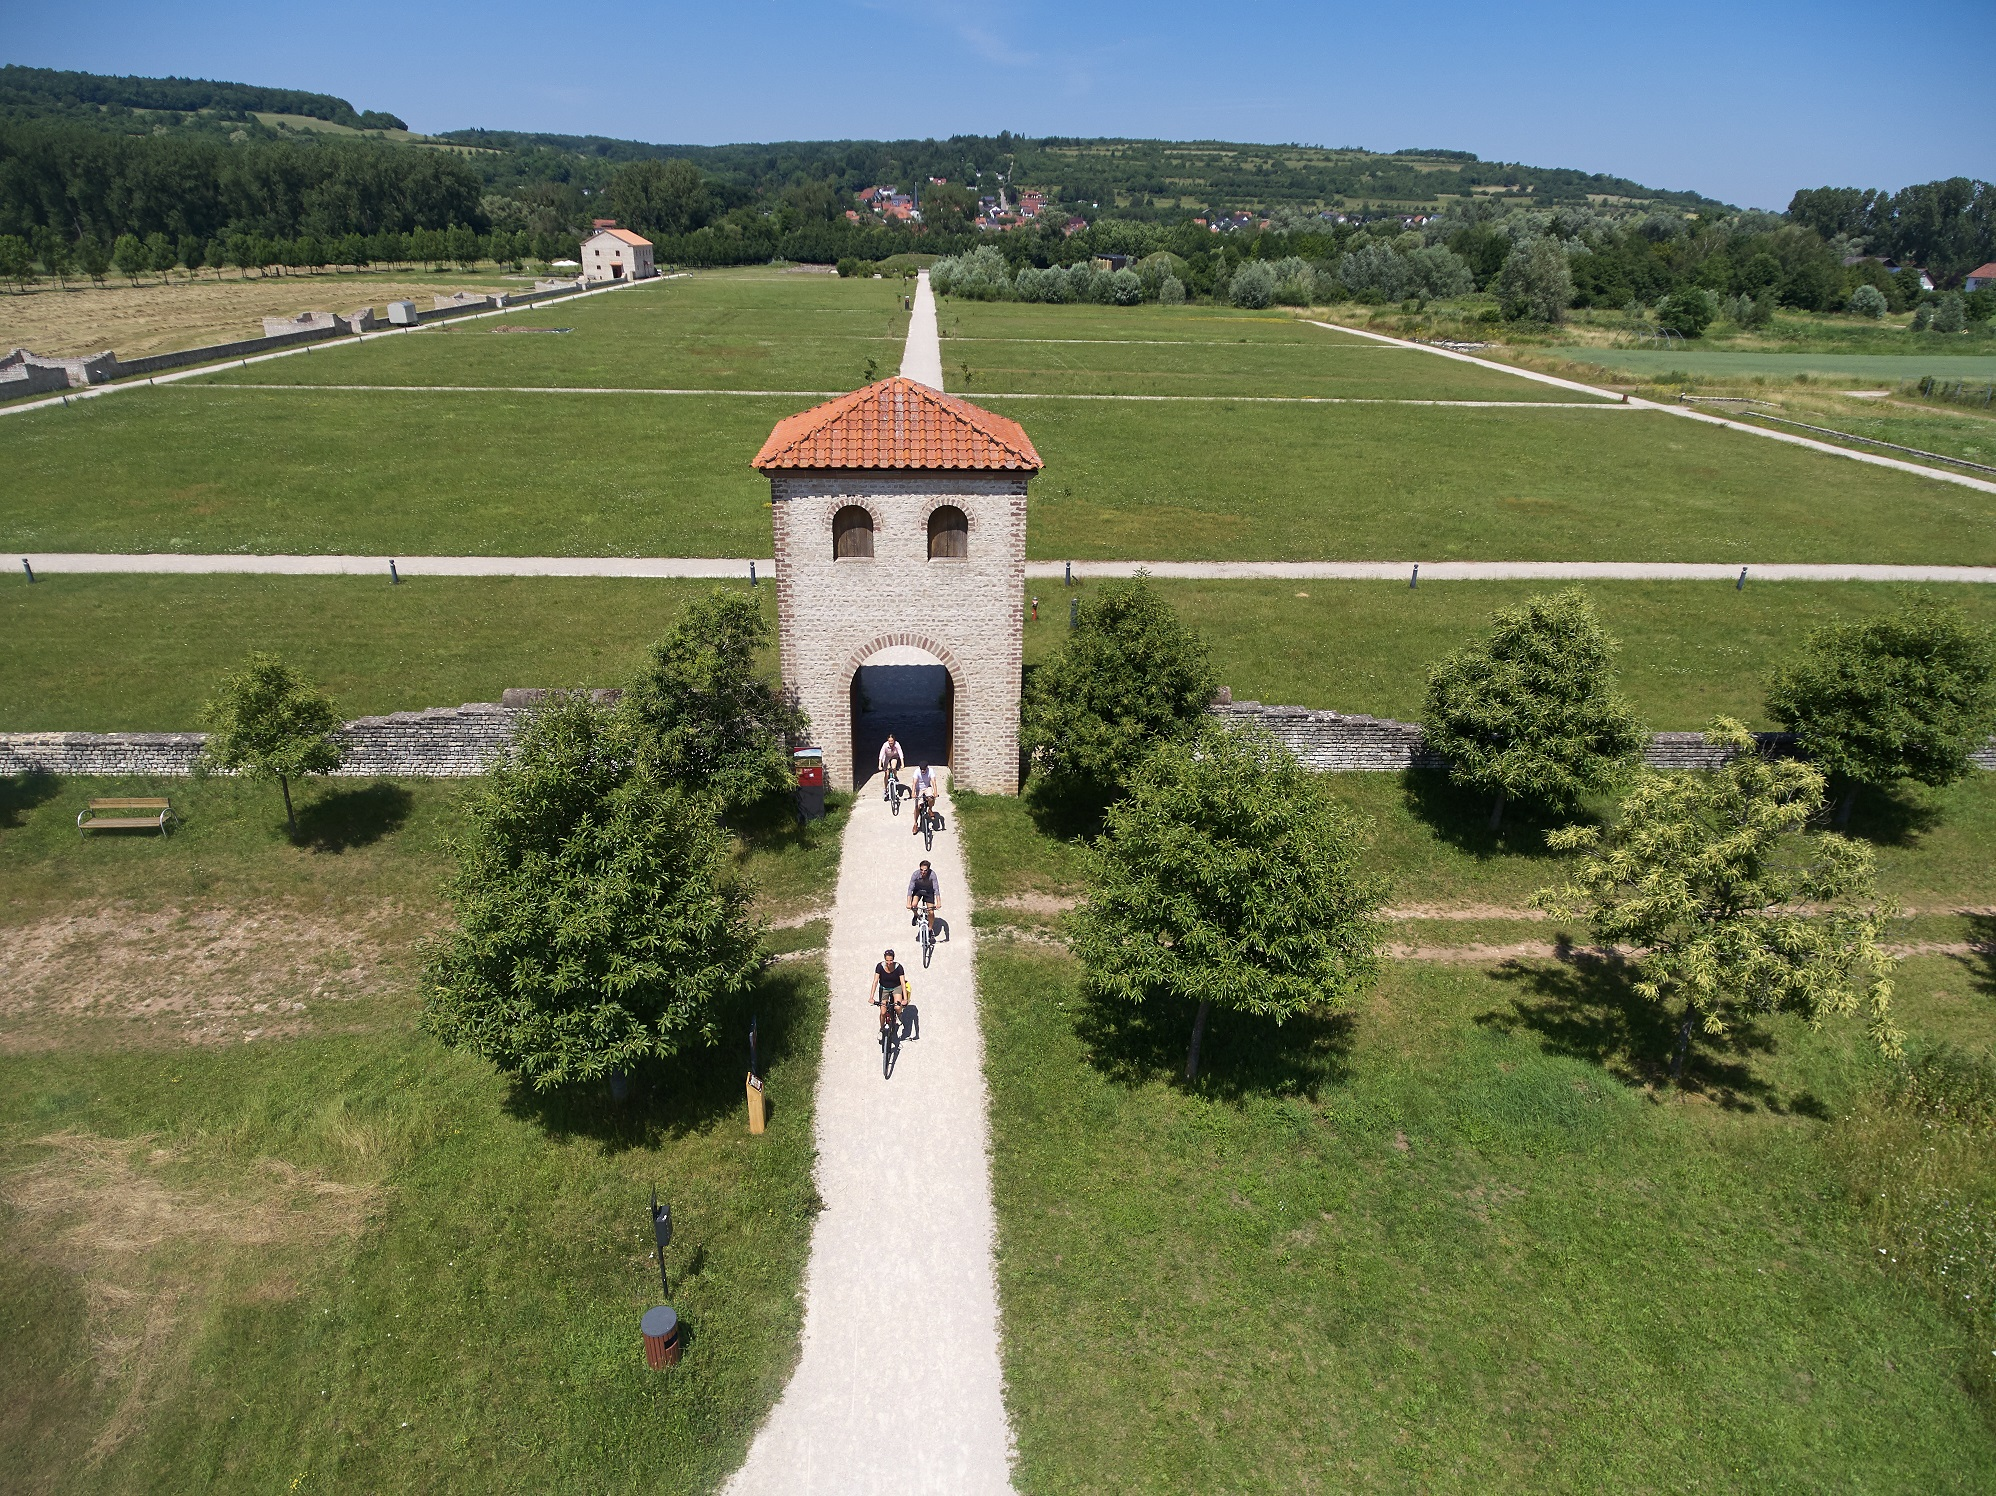 Fahrradfahrer im Europäischen Kulturpark